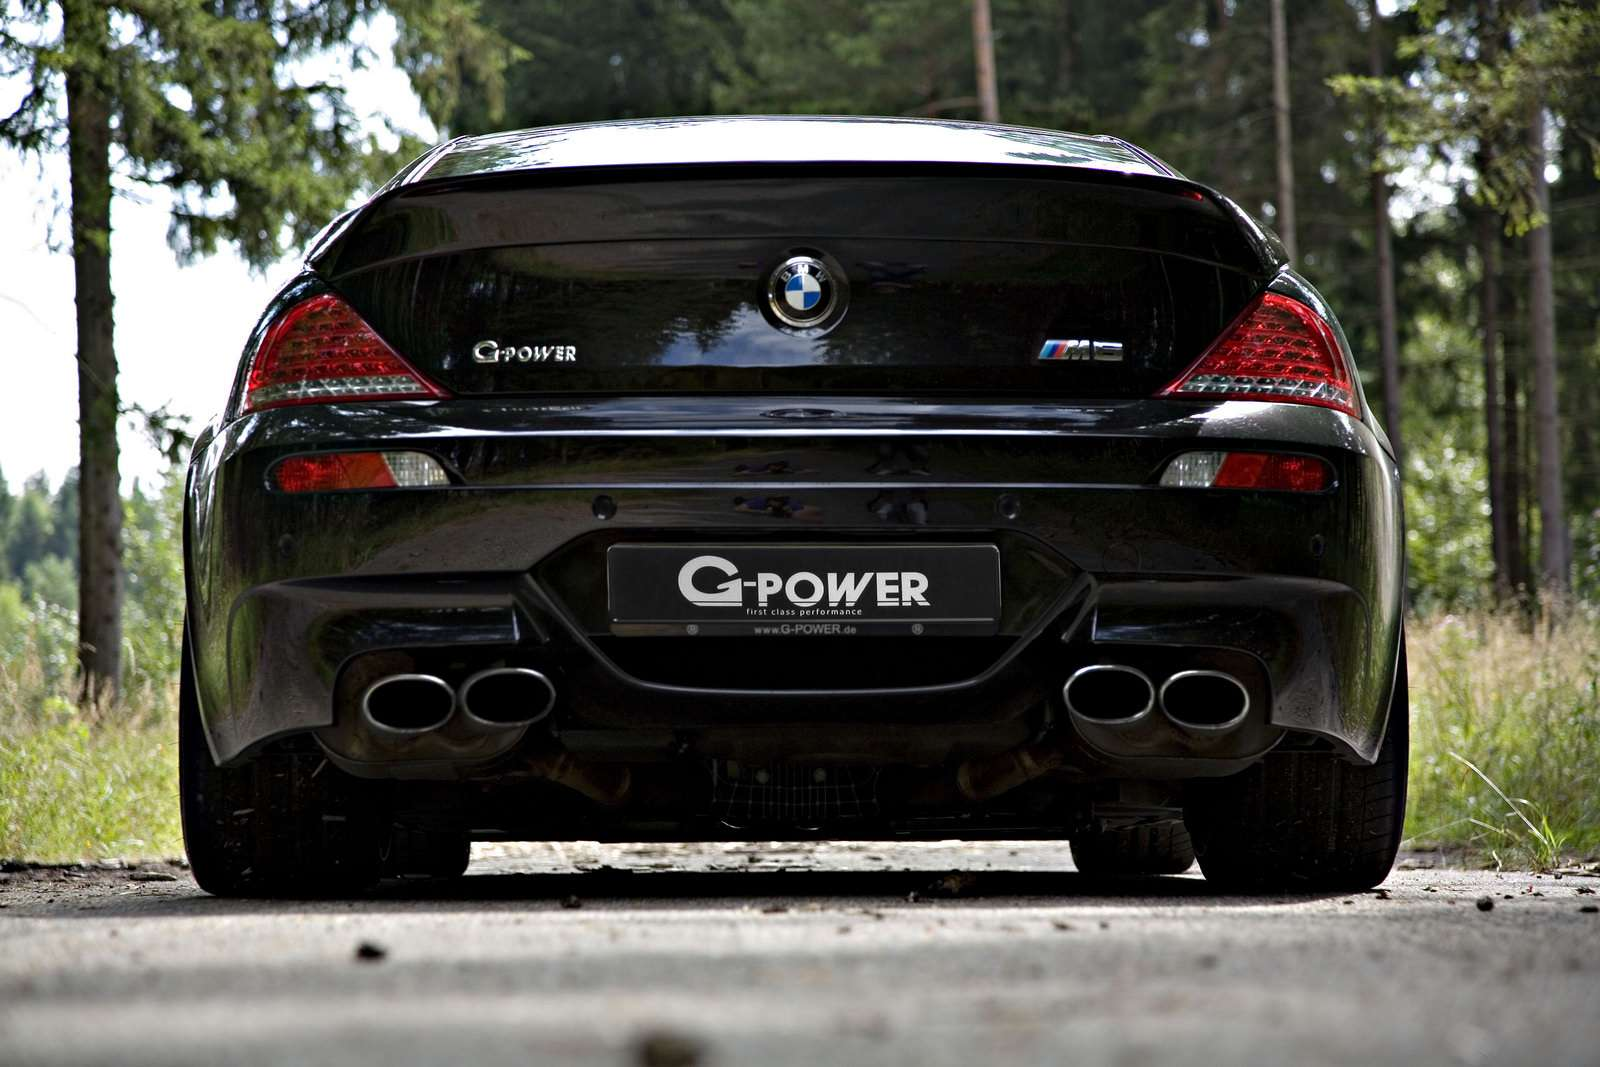 G-Power BMW M6 Hurricane RR 800 listopad 2010